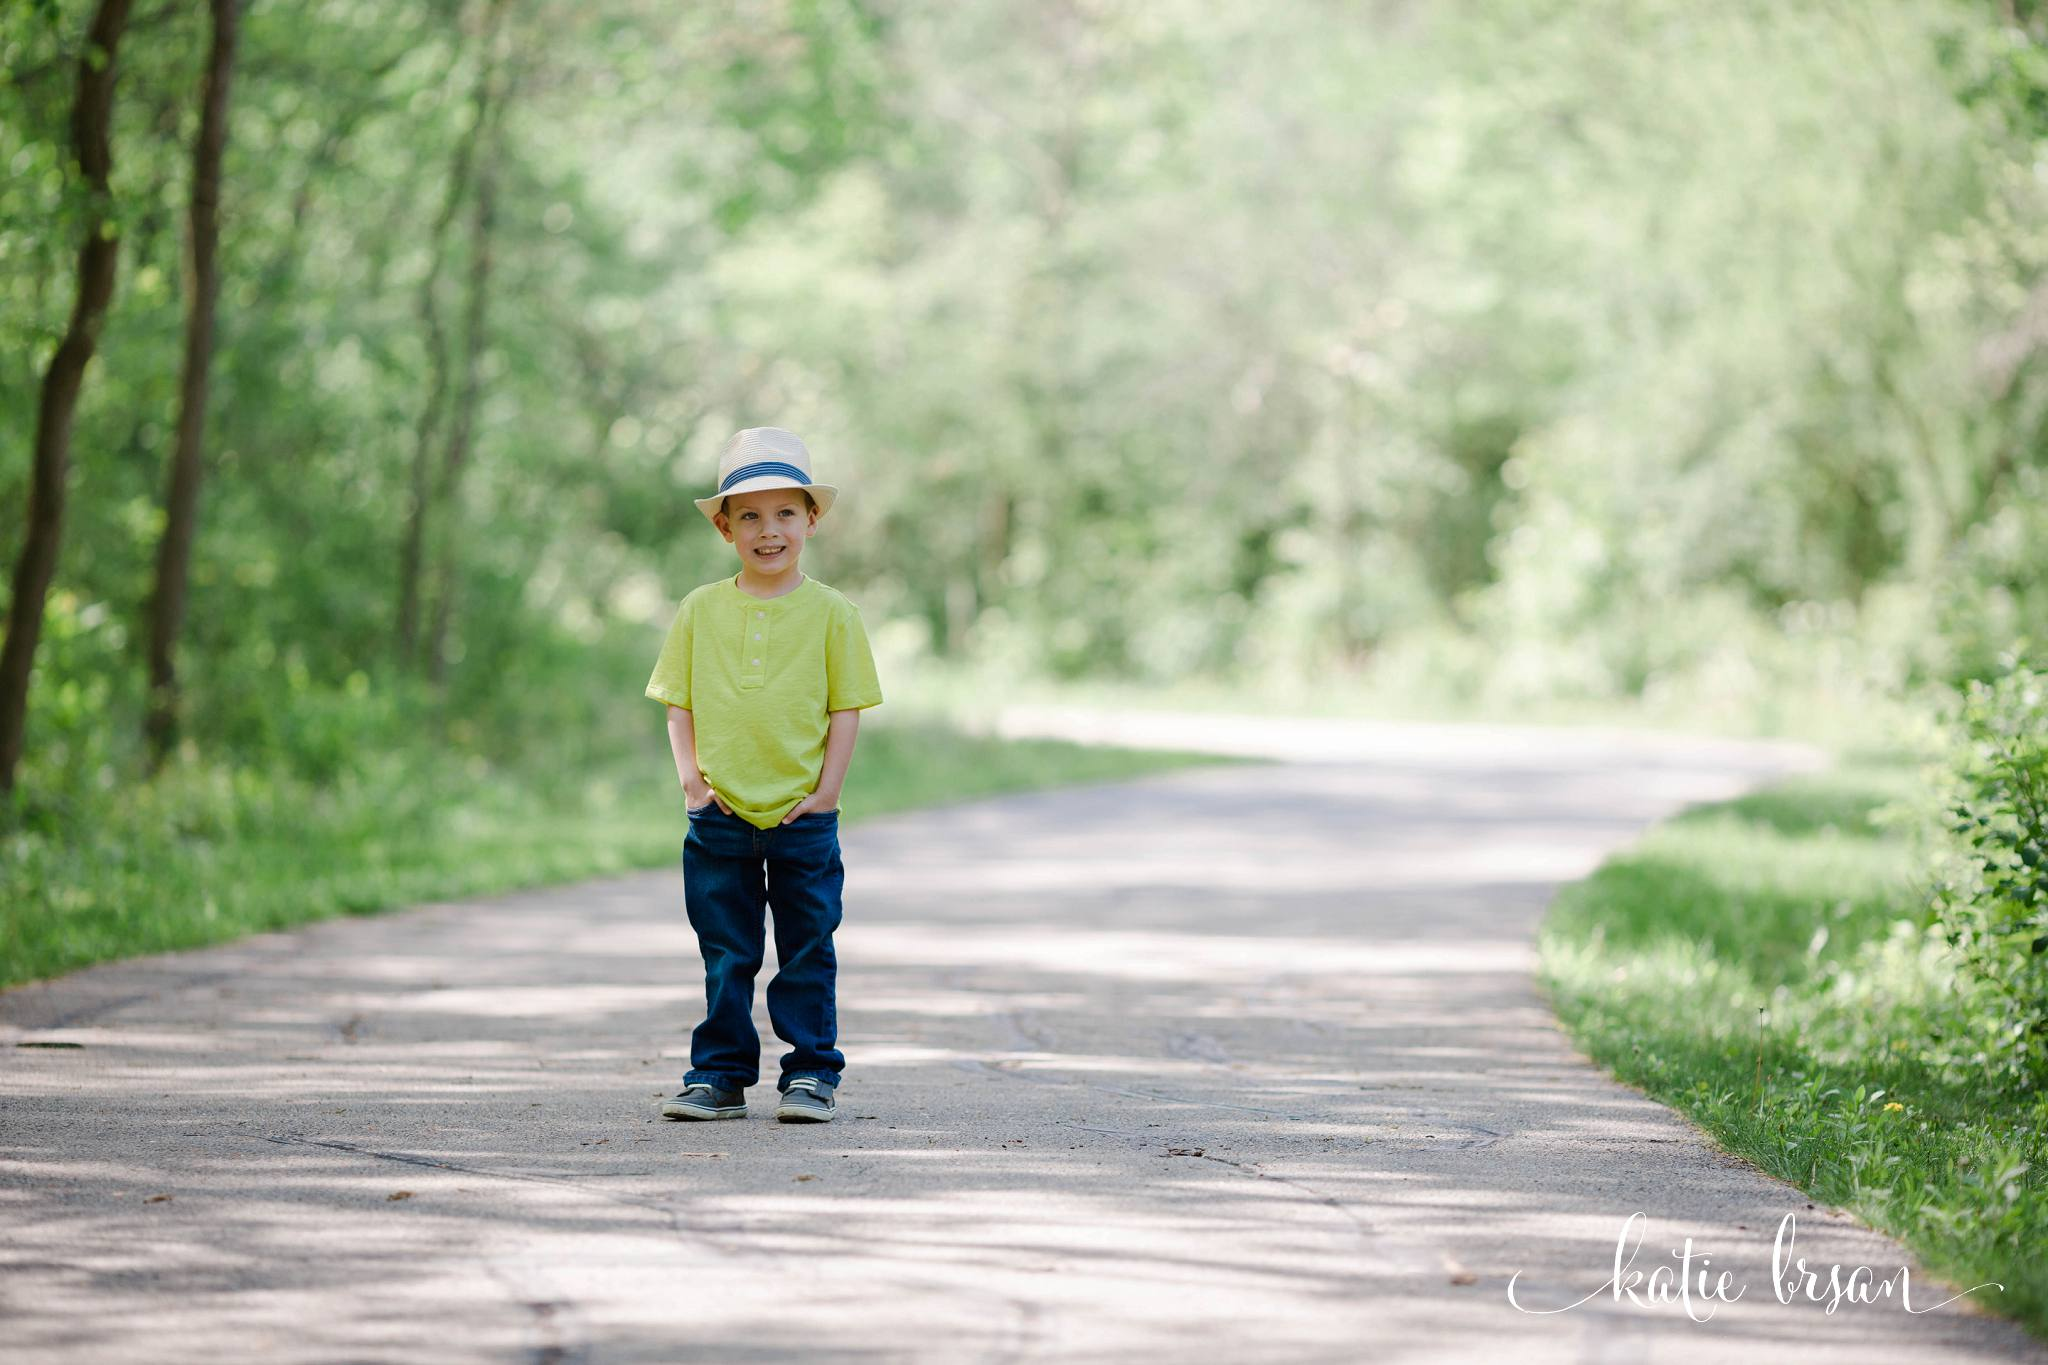 KatieBrsan-Shorewood-ChildPhotographer_0575.jpg